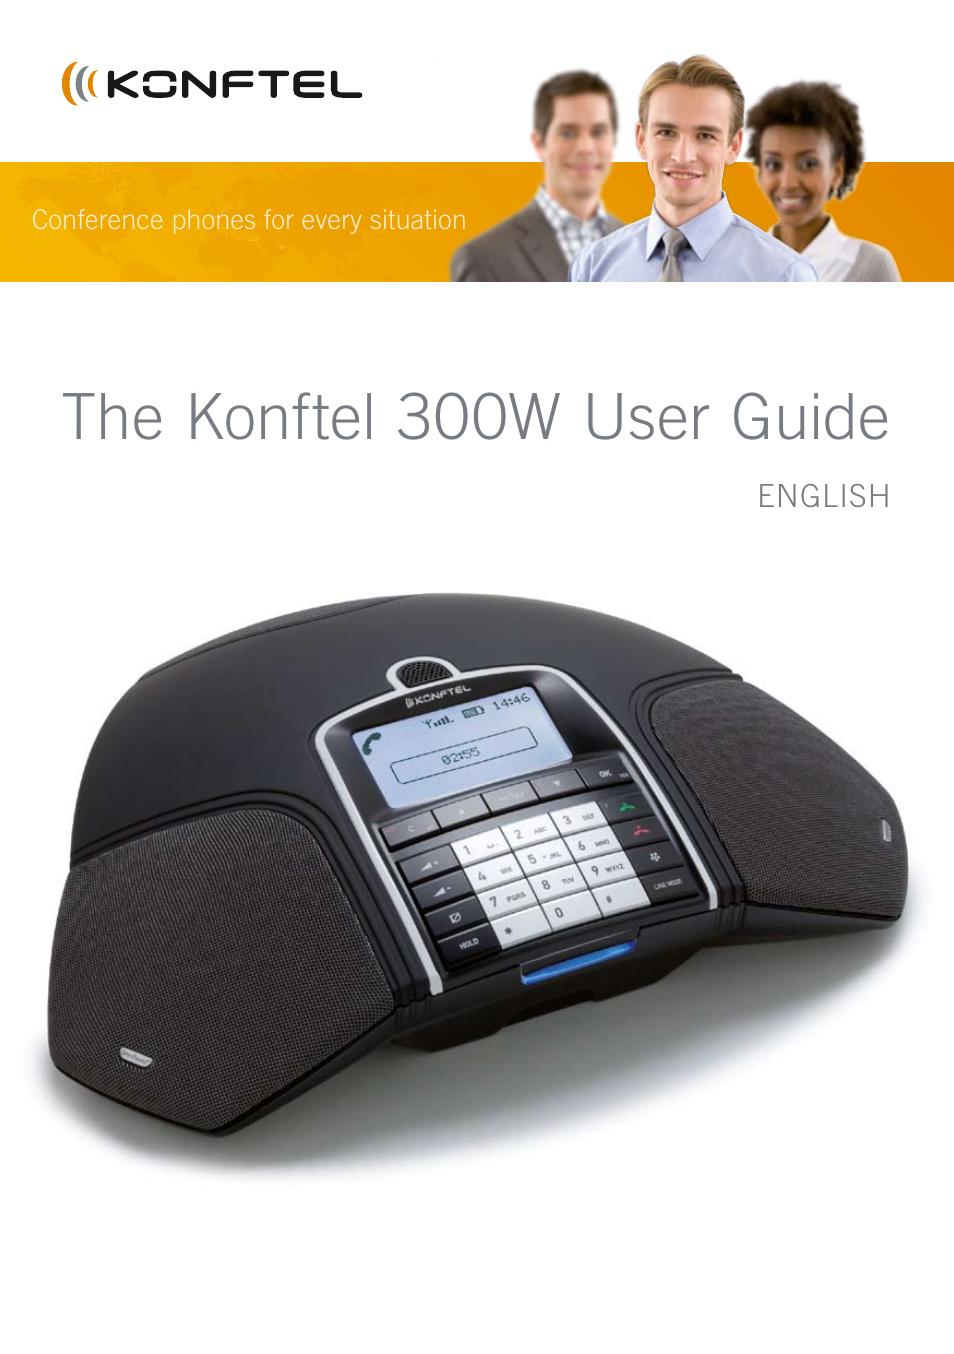 konftel 300w user manual 42 pages rh manualsdir com konftel 300w user manual Konftel 55W